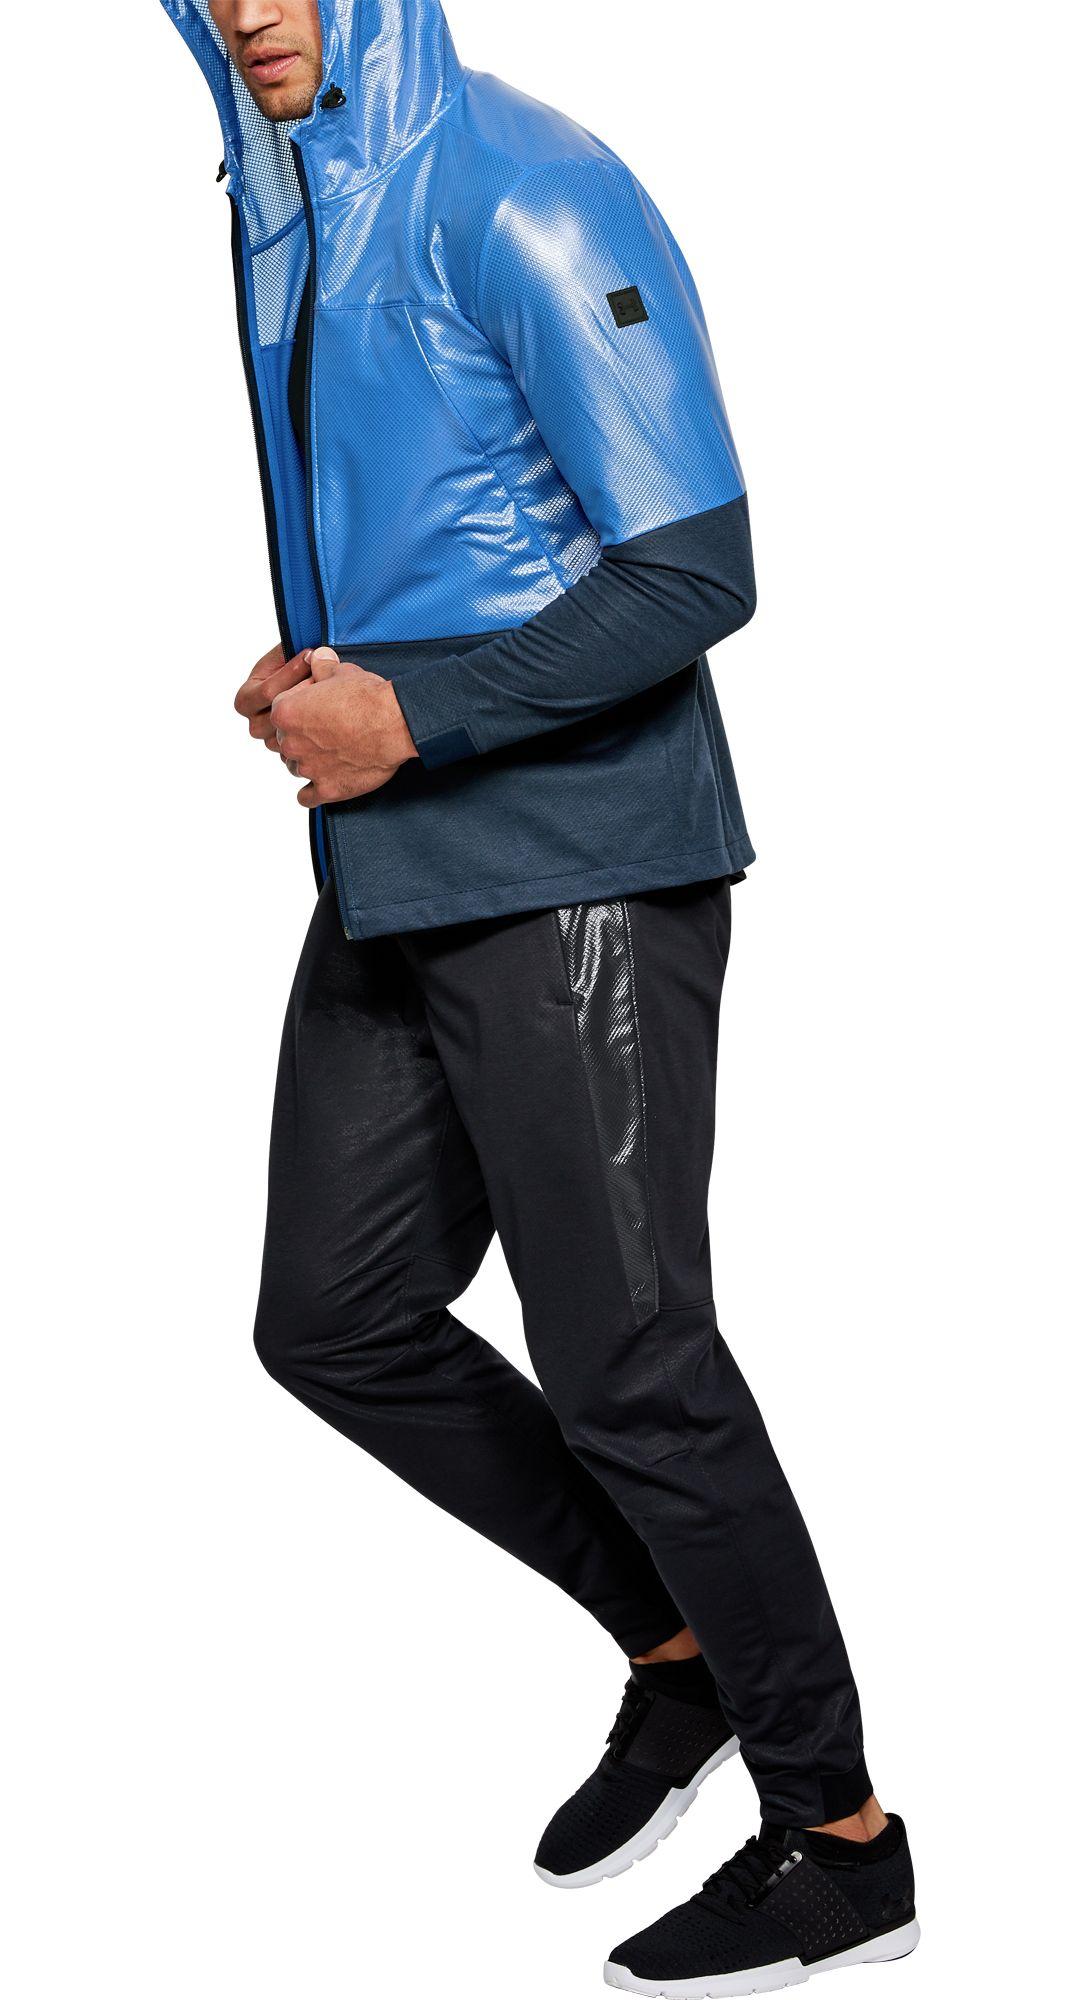 6e6a508b2 Under Armour Men's Sportstyle Elite Full-Zip Jacket. noImageFound.  Previous. 1. 2. 3